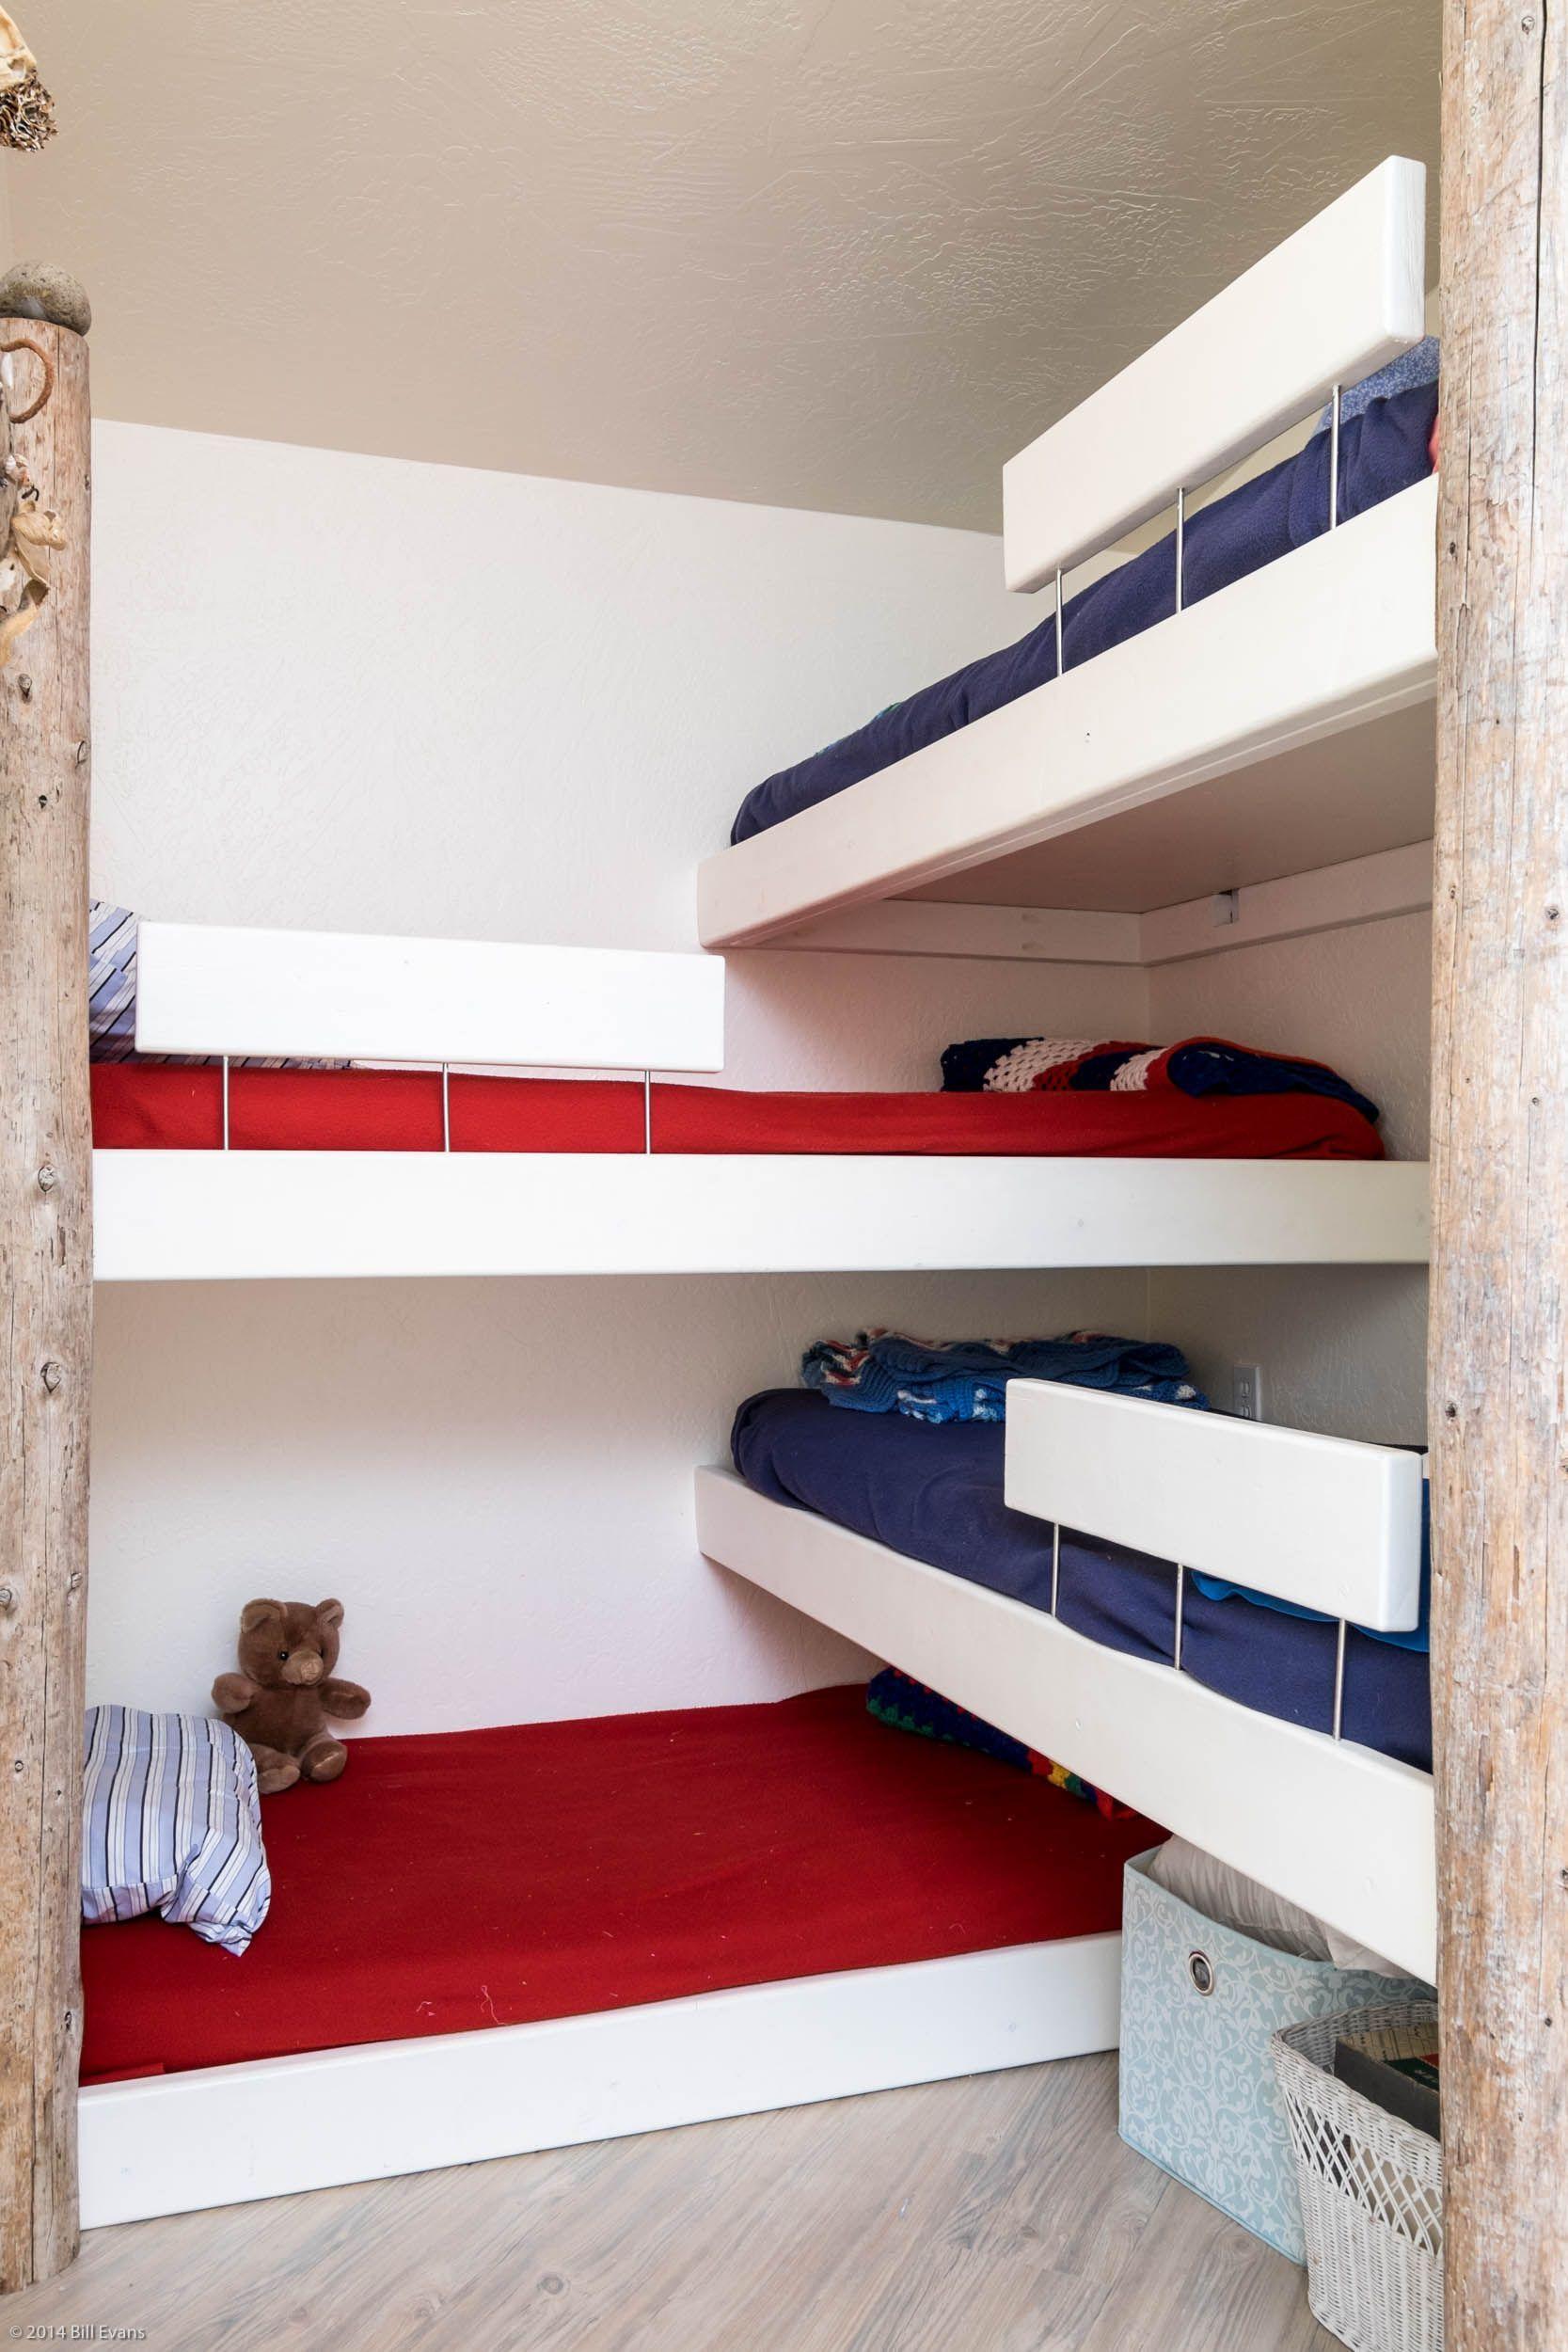 Built in loft bed ideas  Great Idea for that odd corner Built in Bunk Beds Lopez Island WA